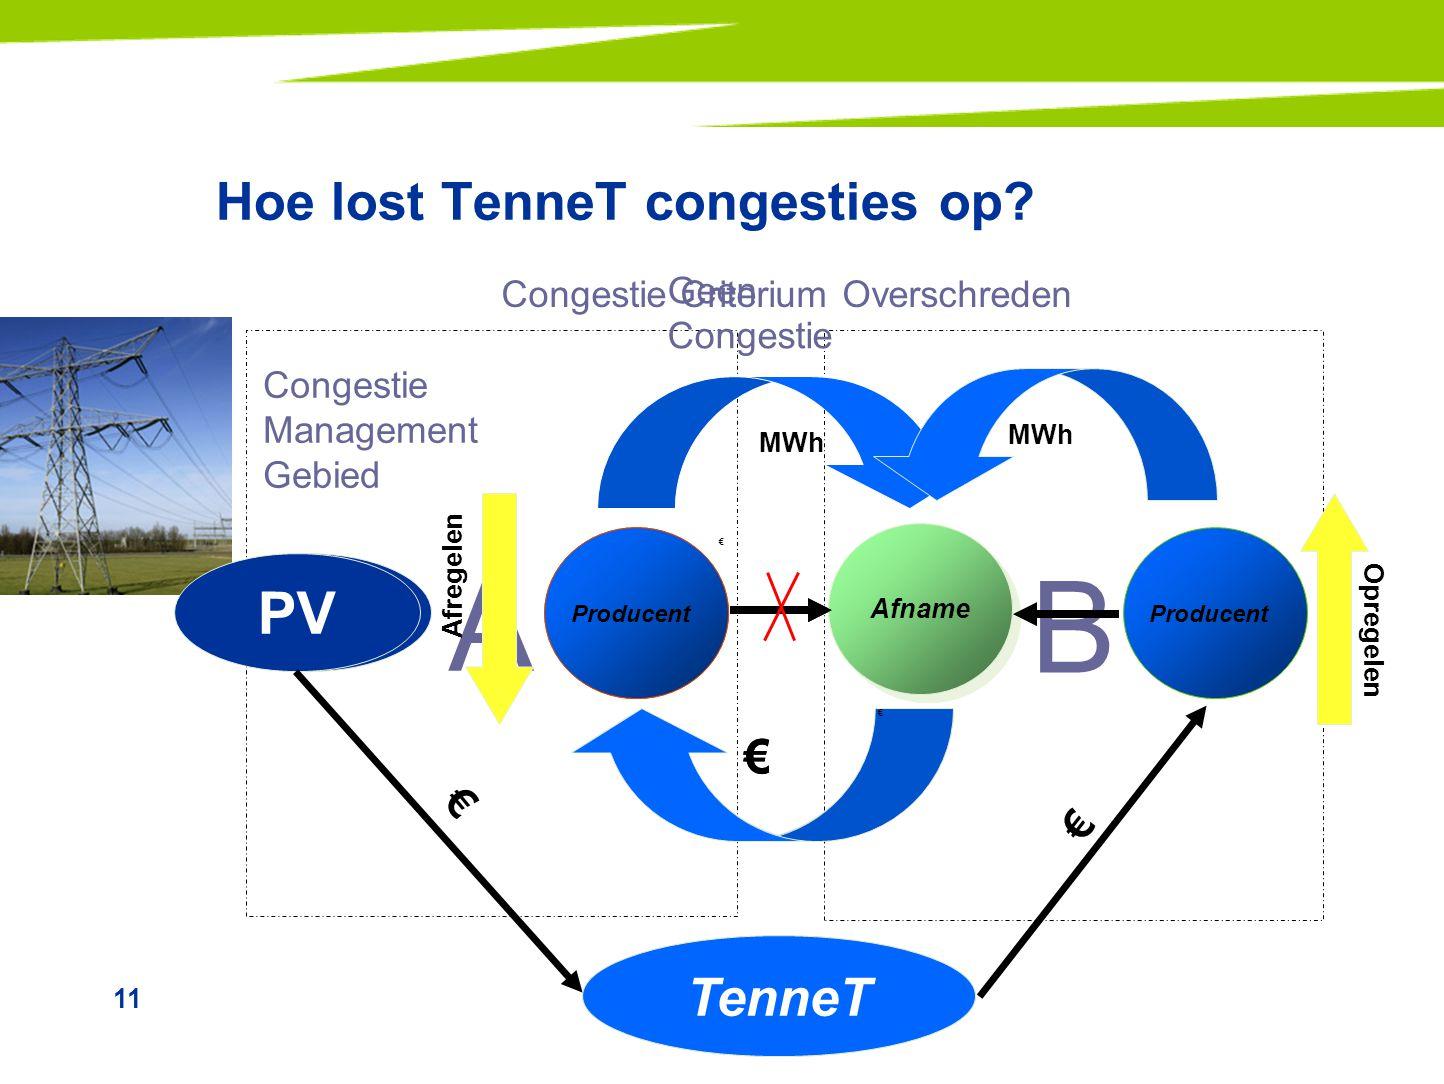 11 Hoe lost TenneT congesties op? A B Congestie Management Gebied Geen Congestie MWh Producen t Afname € Producen t TenneT PV € Producent Afname MWh €